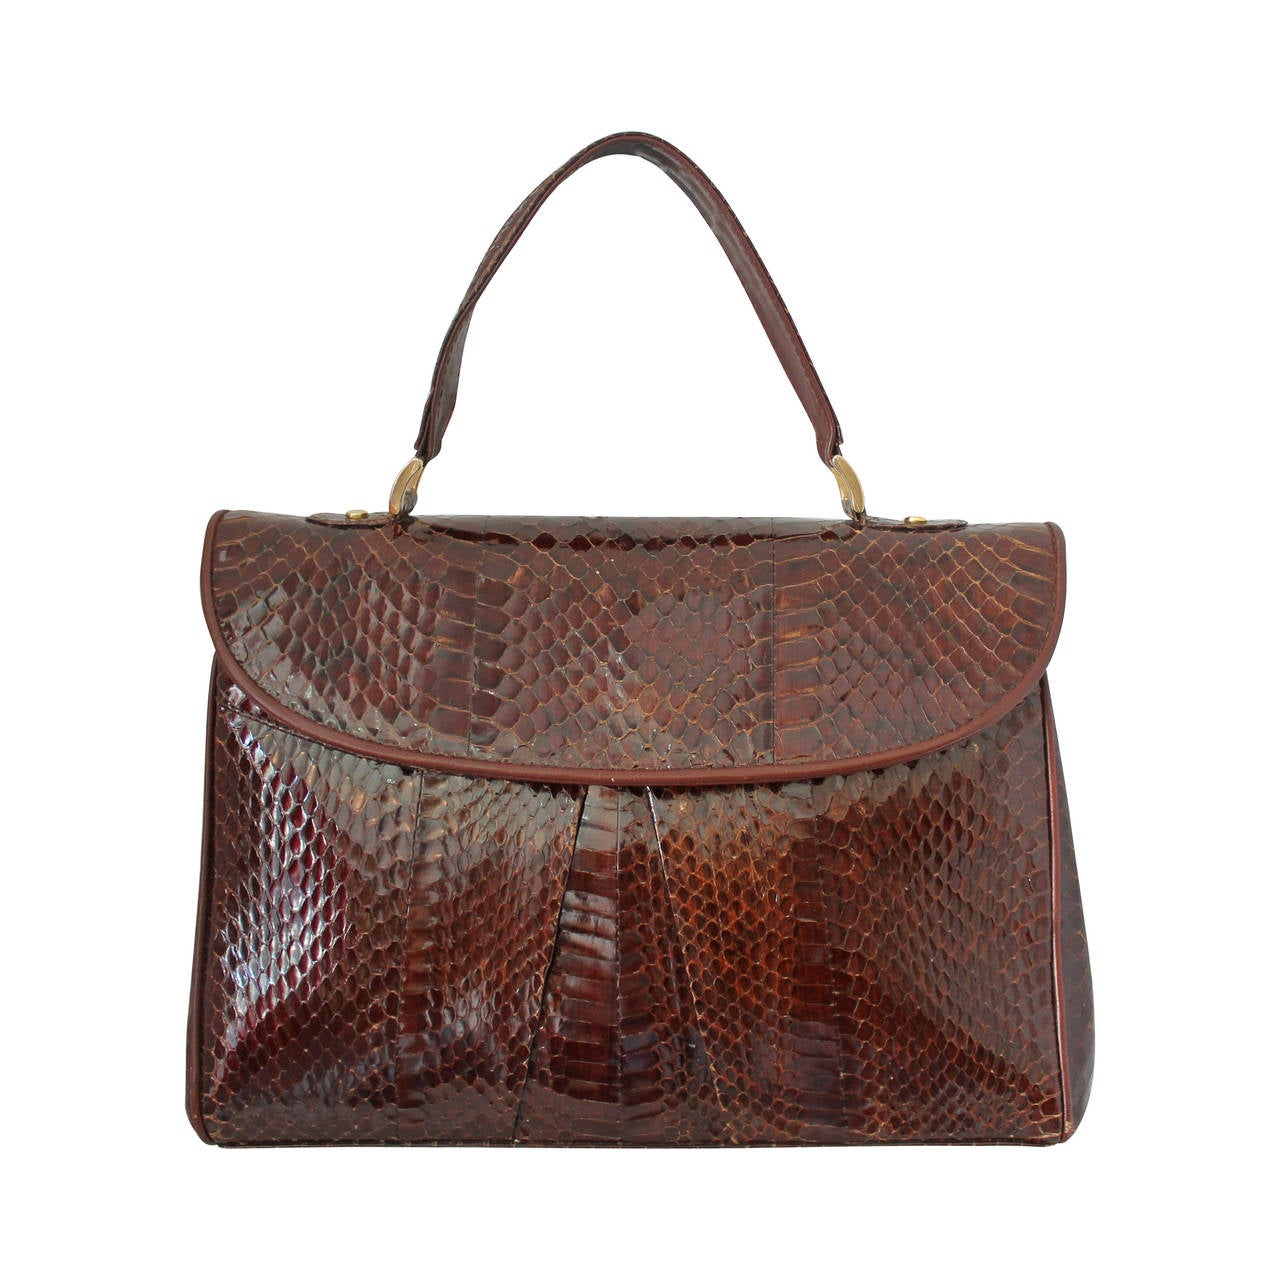 40fddbea3e6b 1960s Amipel Brown Snake Skin Top Handle Bag at 1stdibs